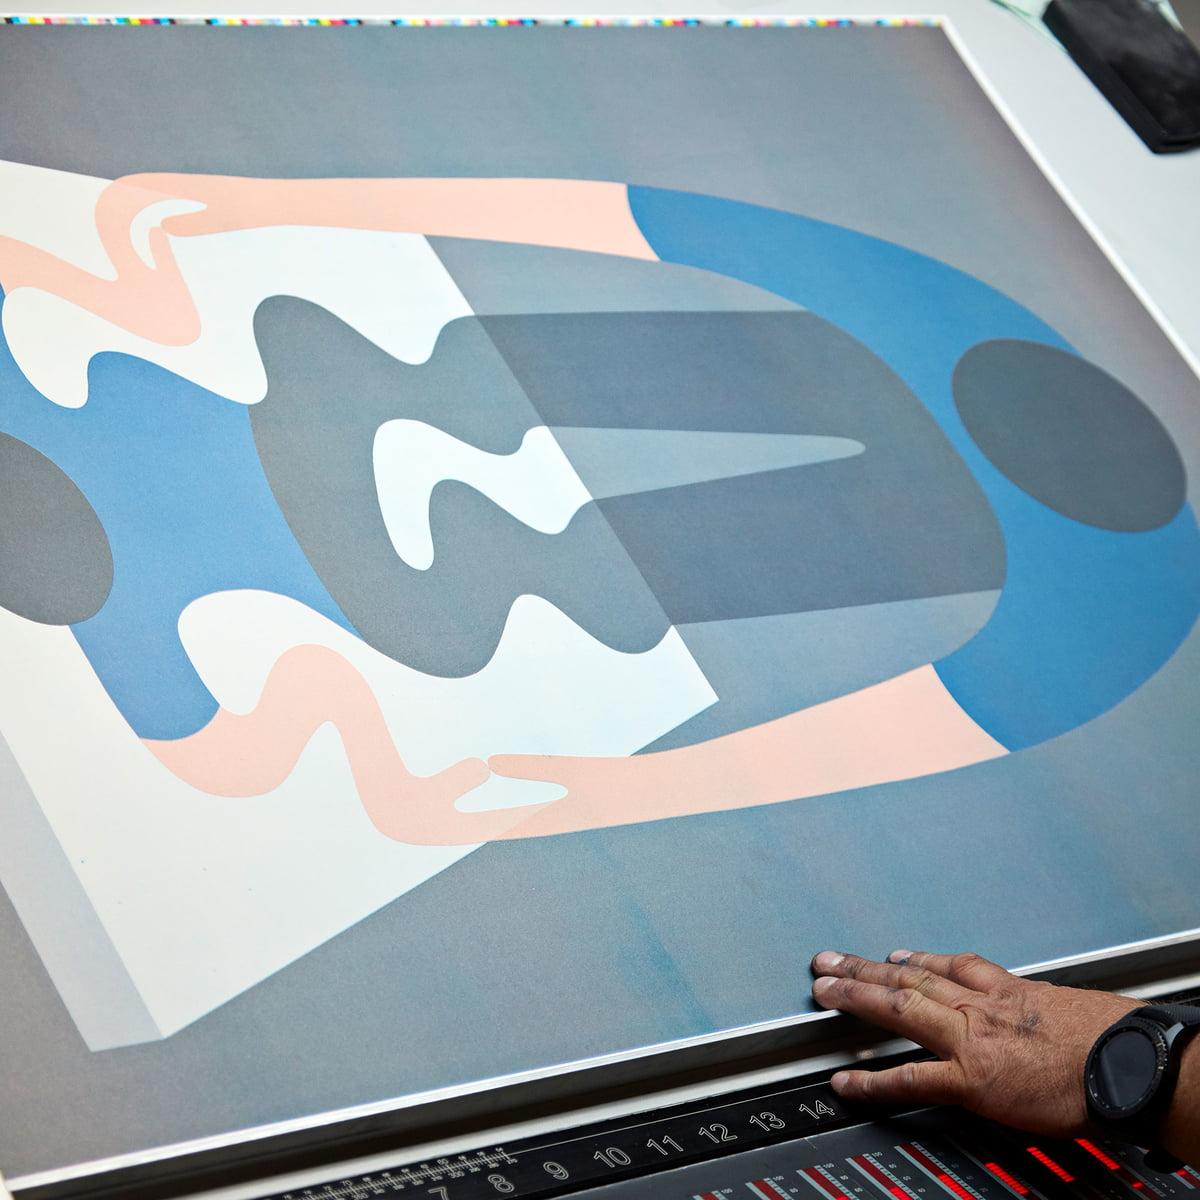 Hay Geoff Mc Fetridge Poster 70 X 100 Cm 1 Blau Herstellung